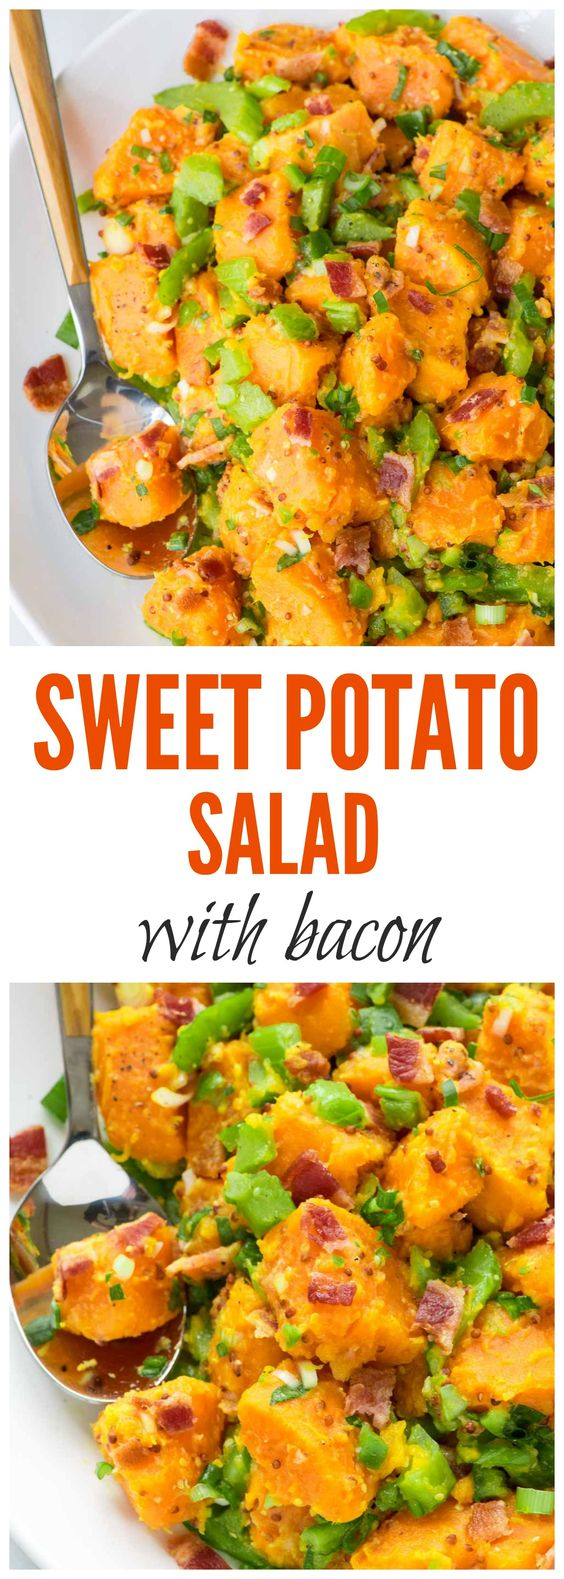 sweet potato salad with bacon - paleo, gluten free